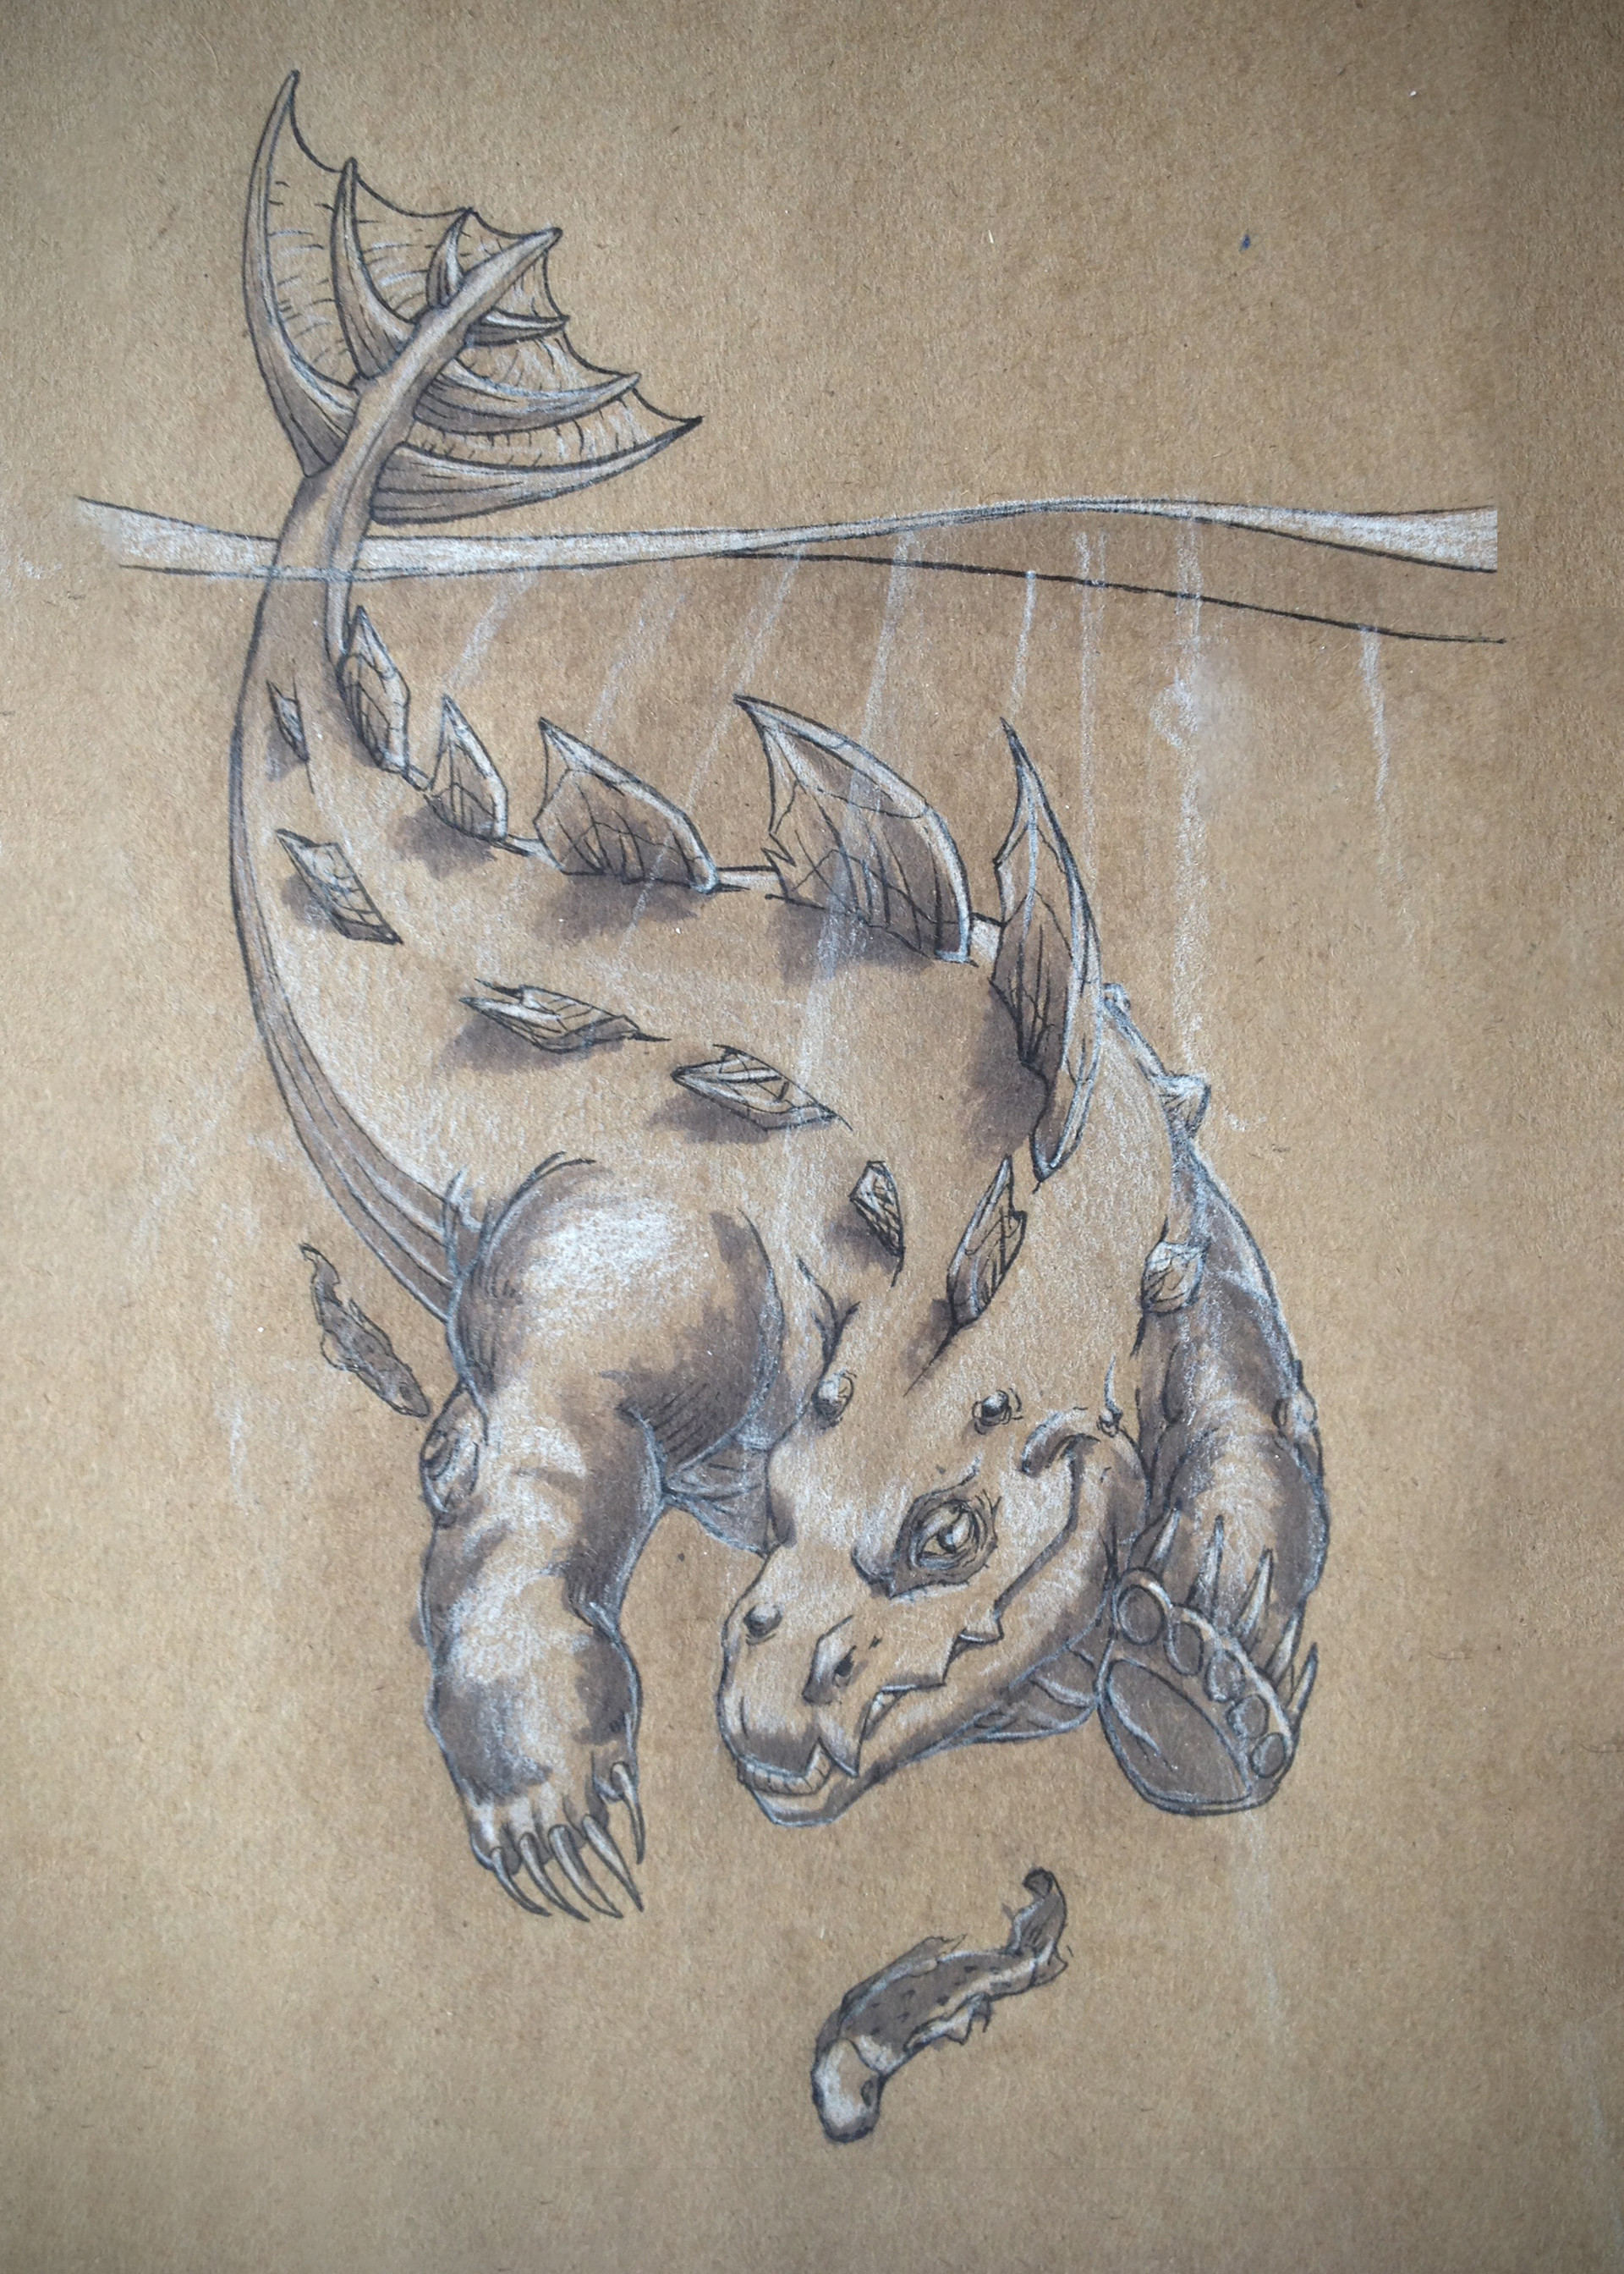 Felipe blanco grizzlesaurus